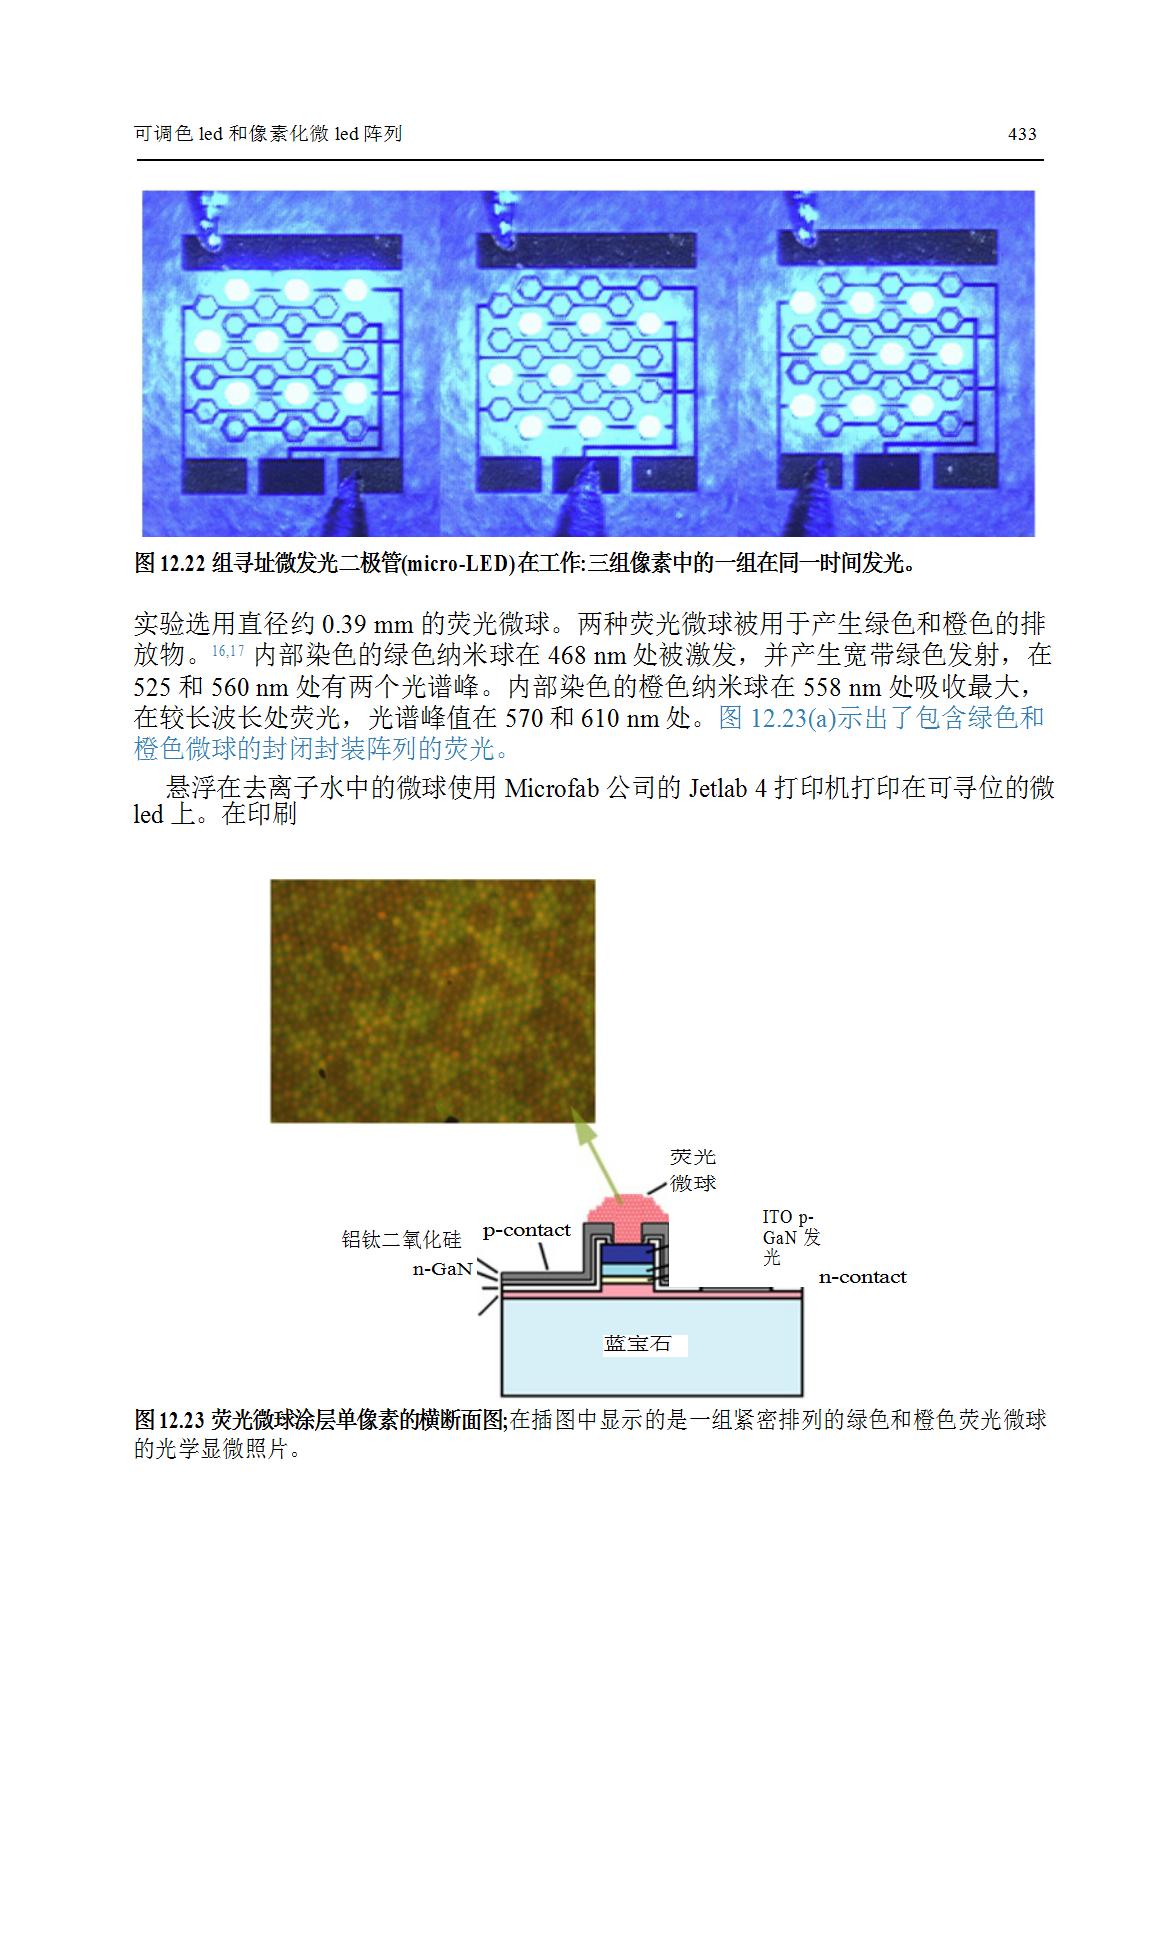 LED调色和像素化MicroLED阵列研究  第19张